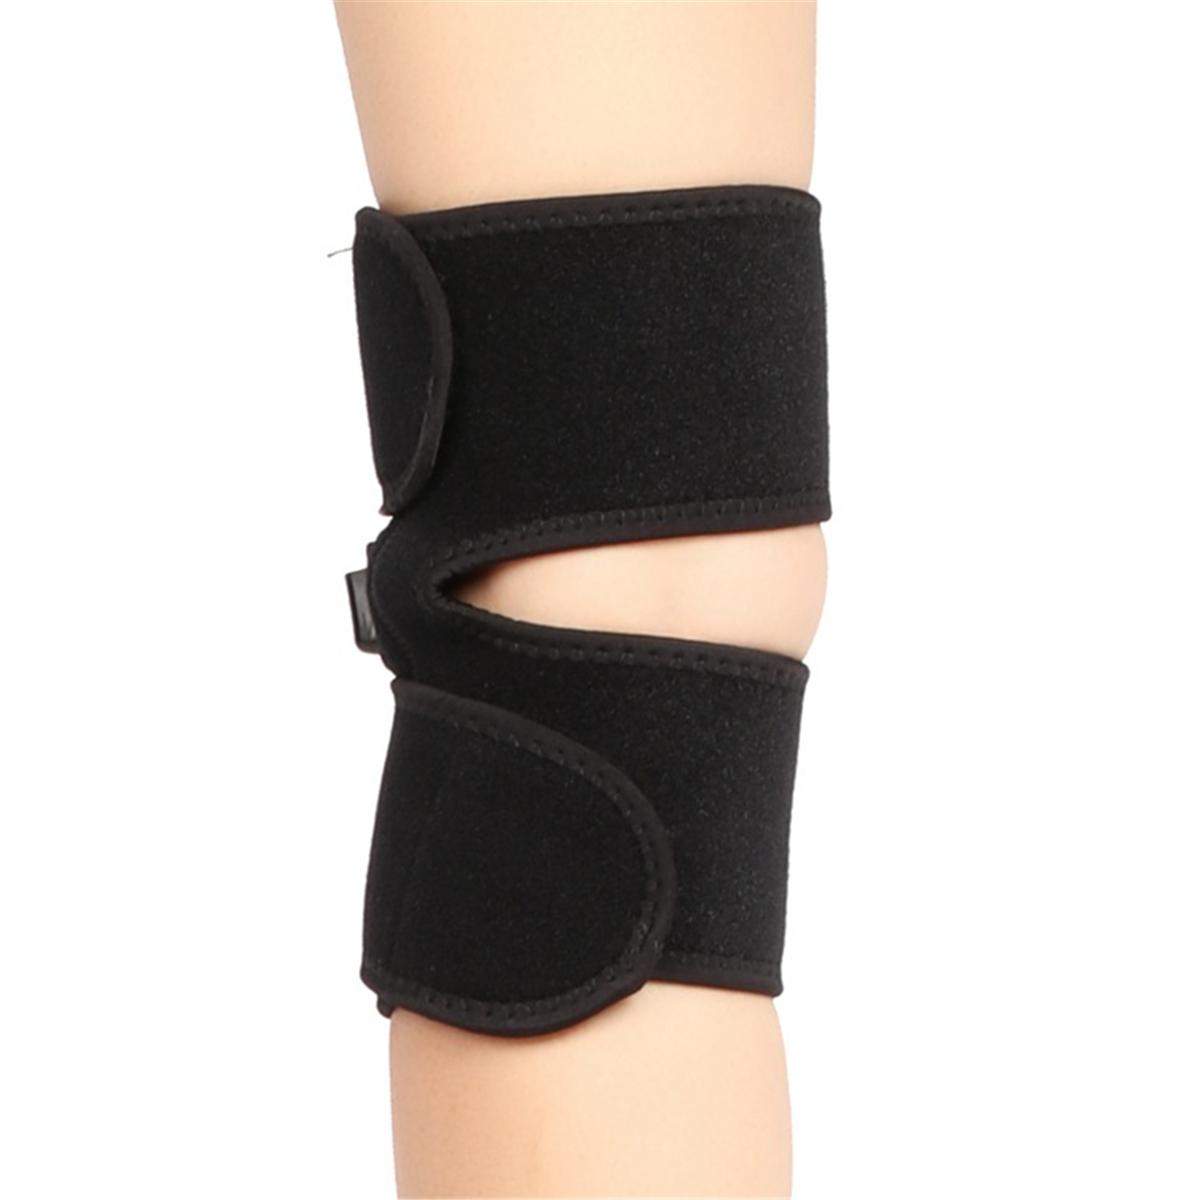 USB Heated Knee Pad Electric Warm Therapy Leg Wrap Belt Brace Arthritis Pain Relief